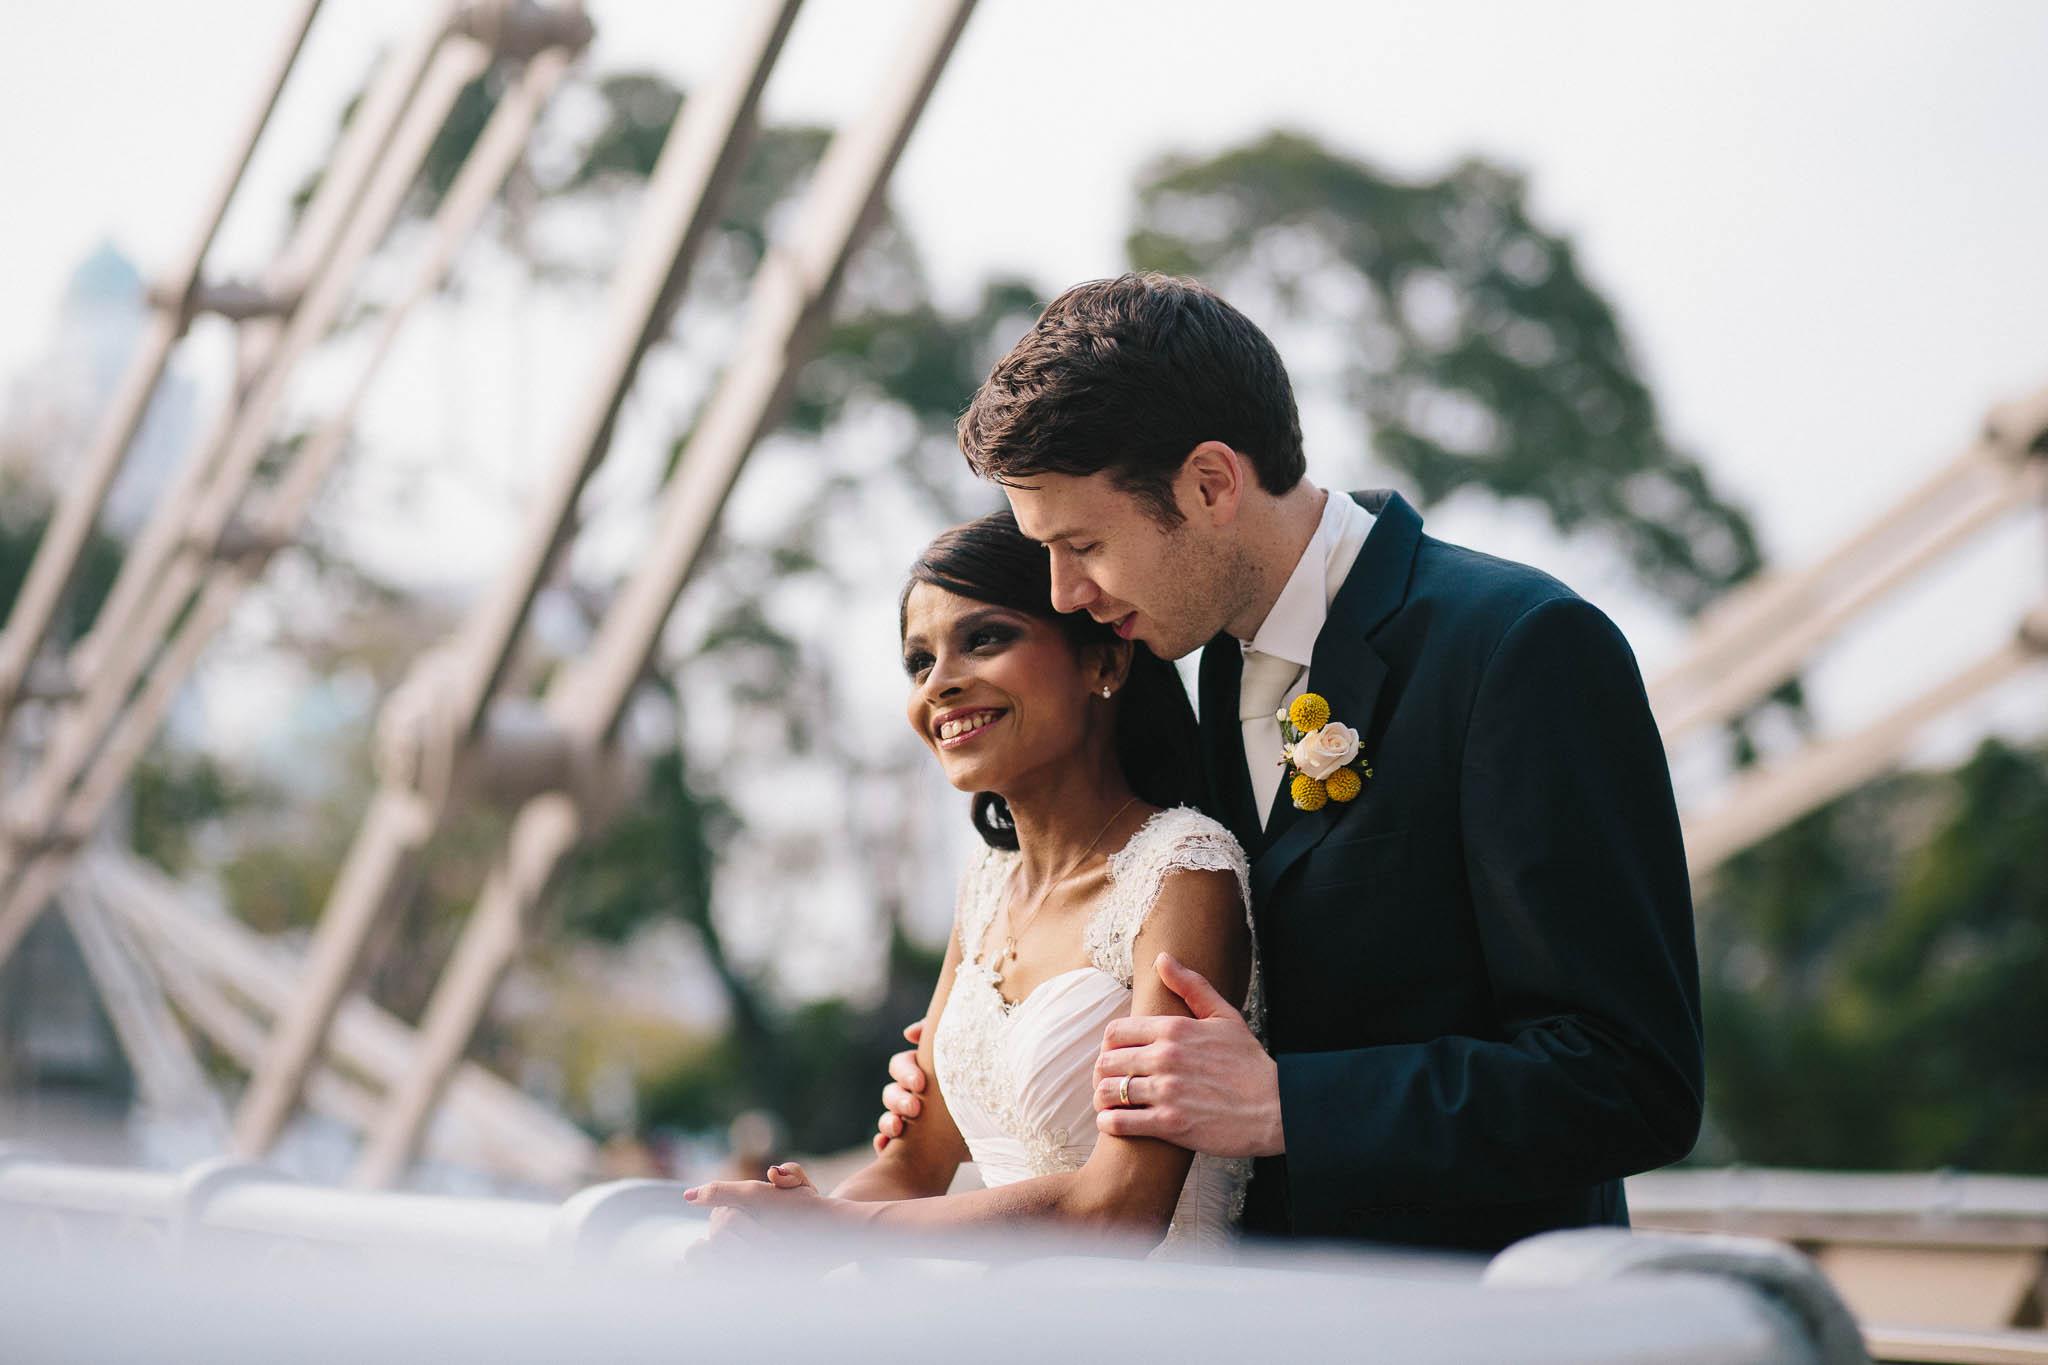 singapore-wedding-photographer-st-andrews-cathedral-renita-david-45.jpg